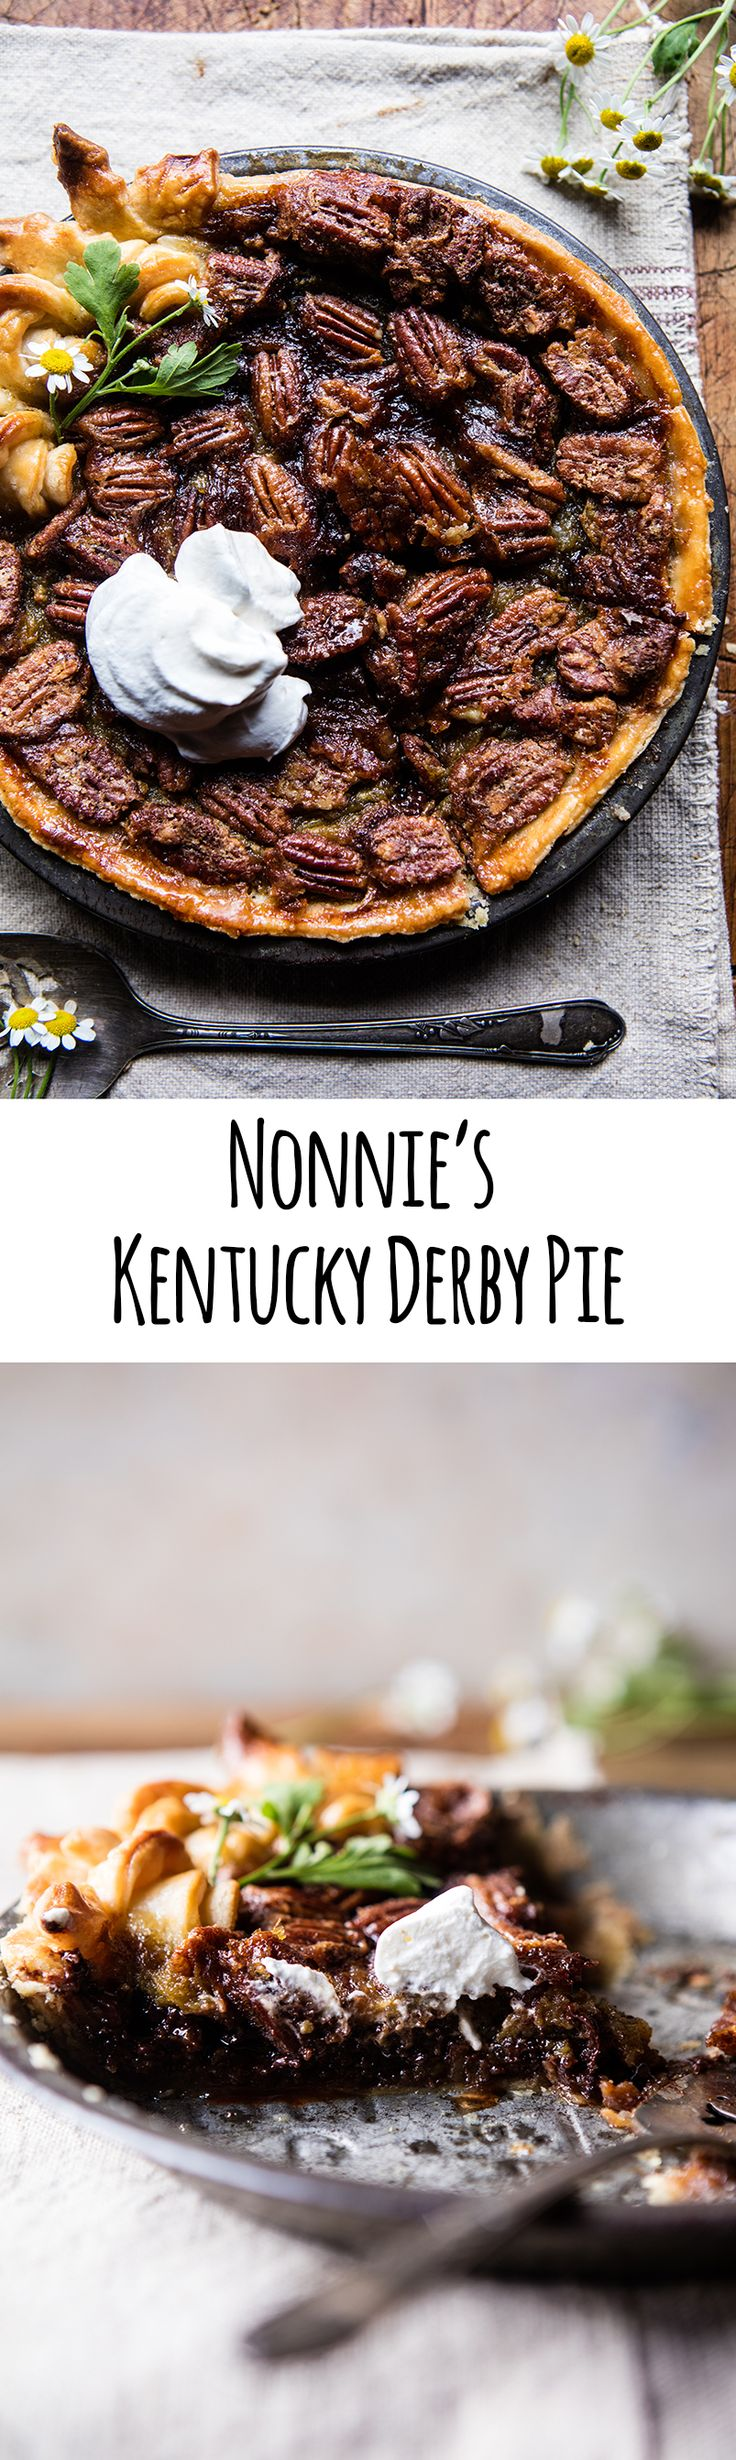 Nonnie's Kentucky Derby Pie | halfbakedharvest.com @hbharvest